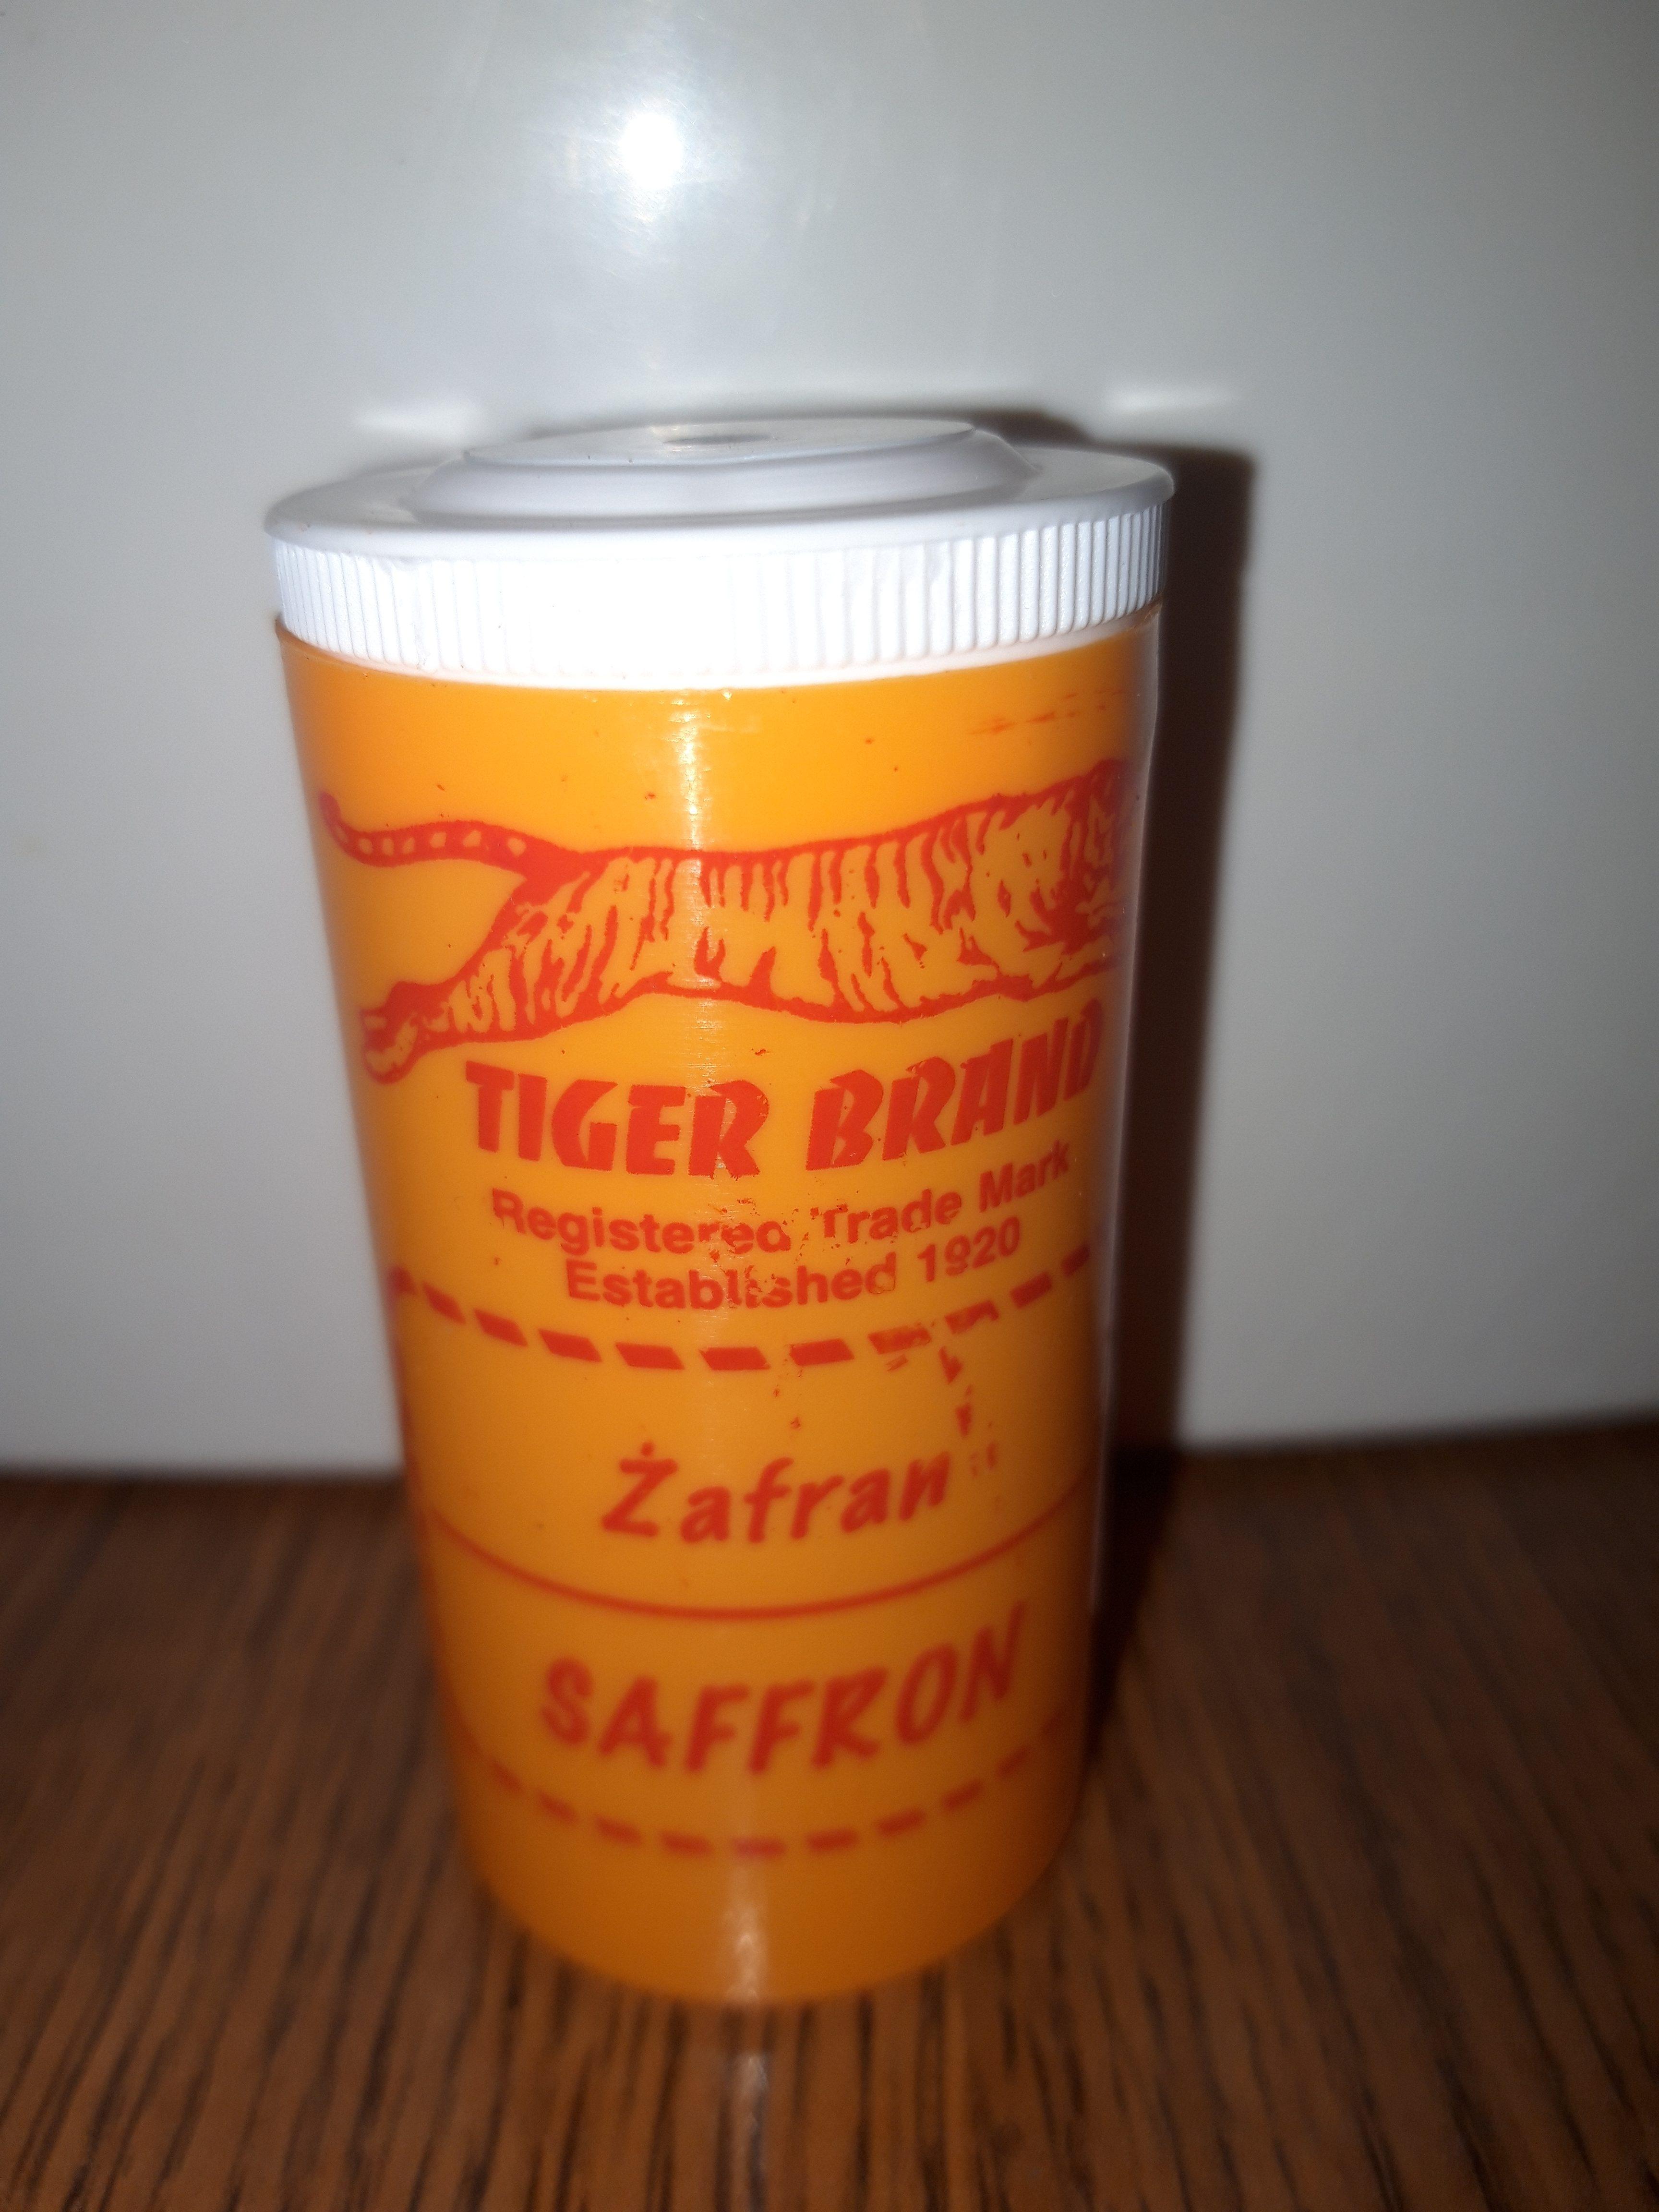 TIGER BRAND SAFFRON